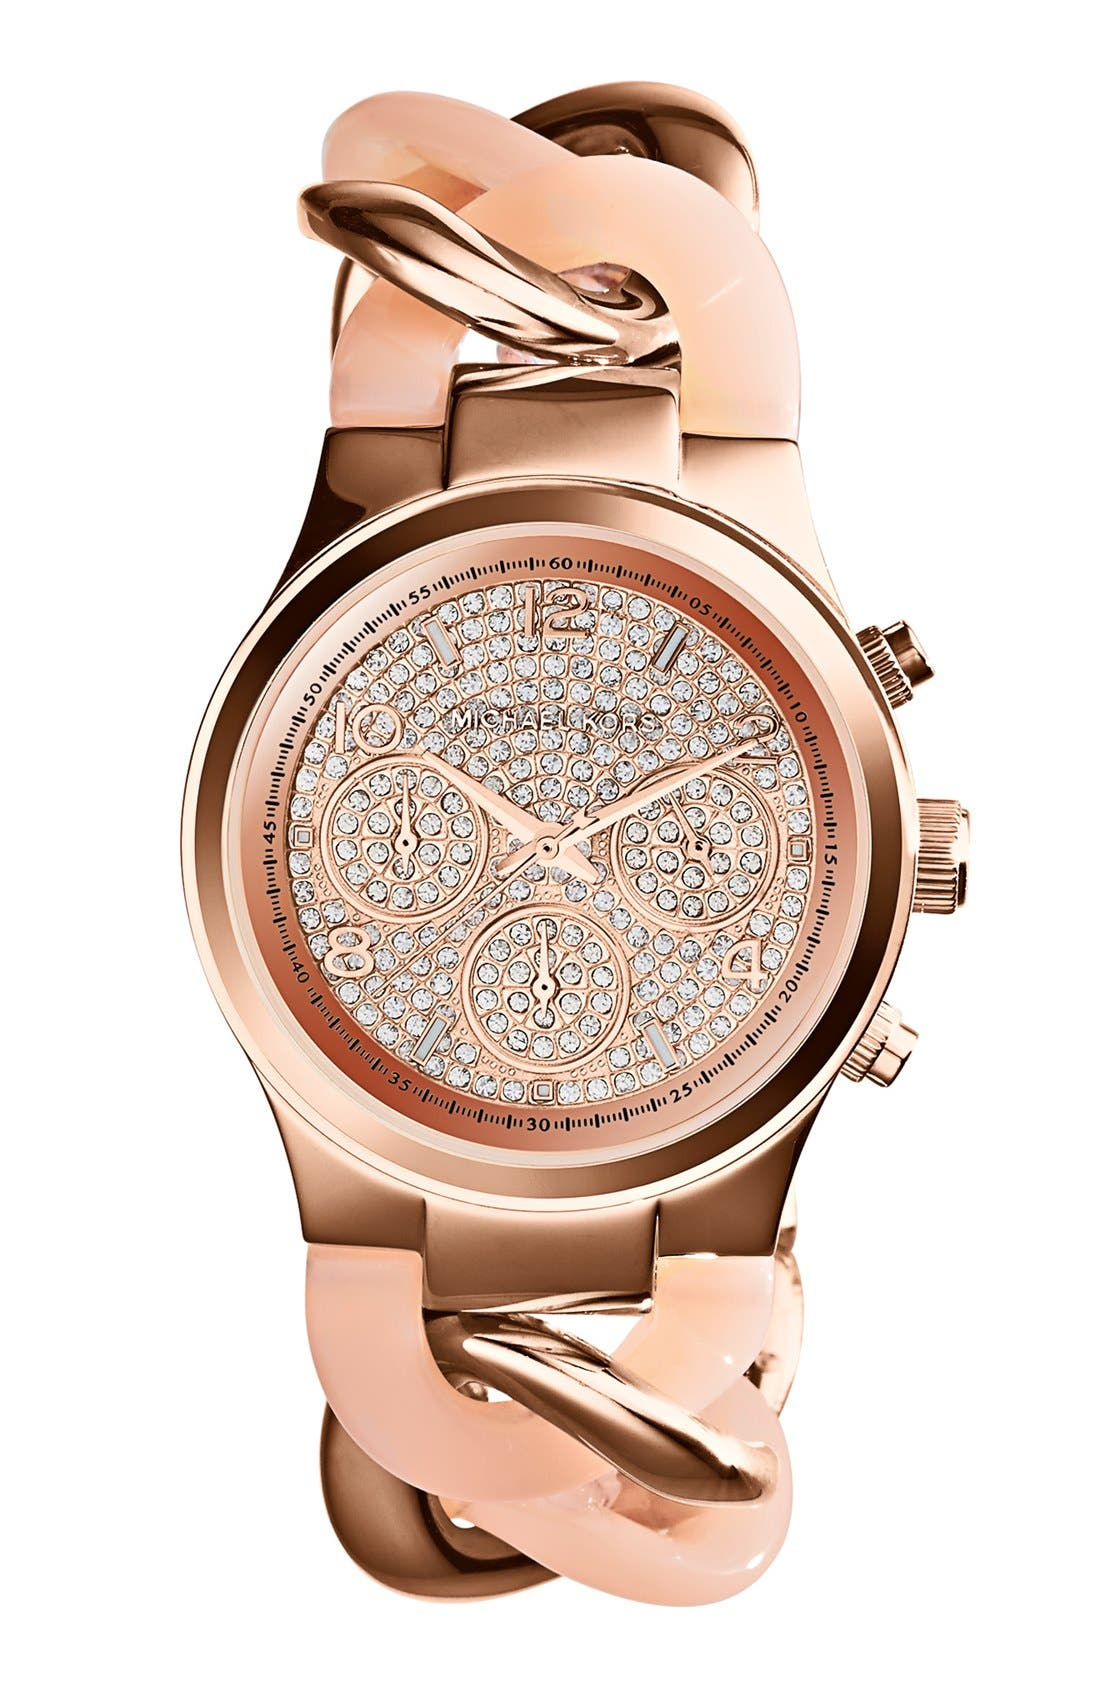 Main Image - Michael Kors 'Runway' Pavé Dial Chronograph Link Bracelet Watch, 38mm